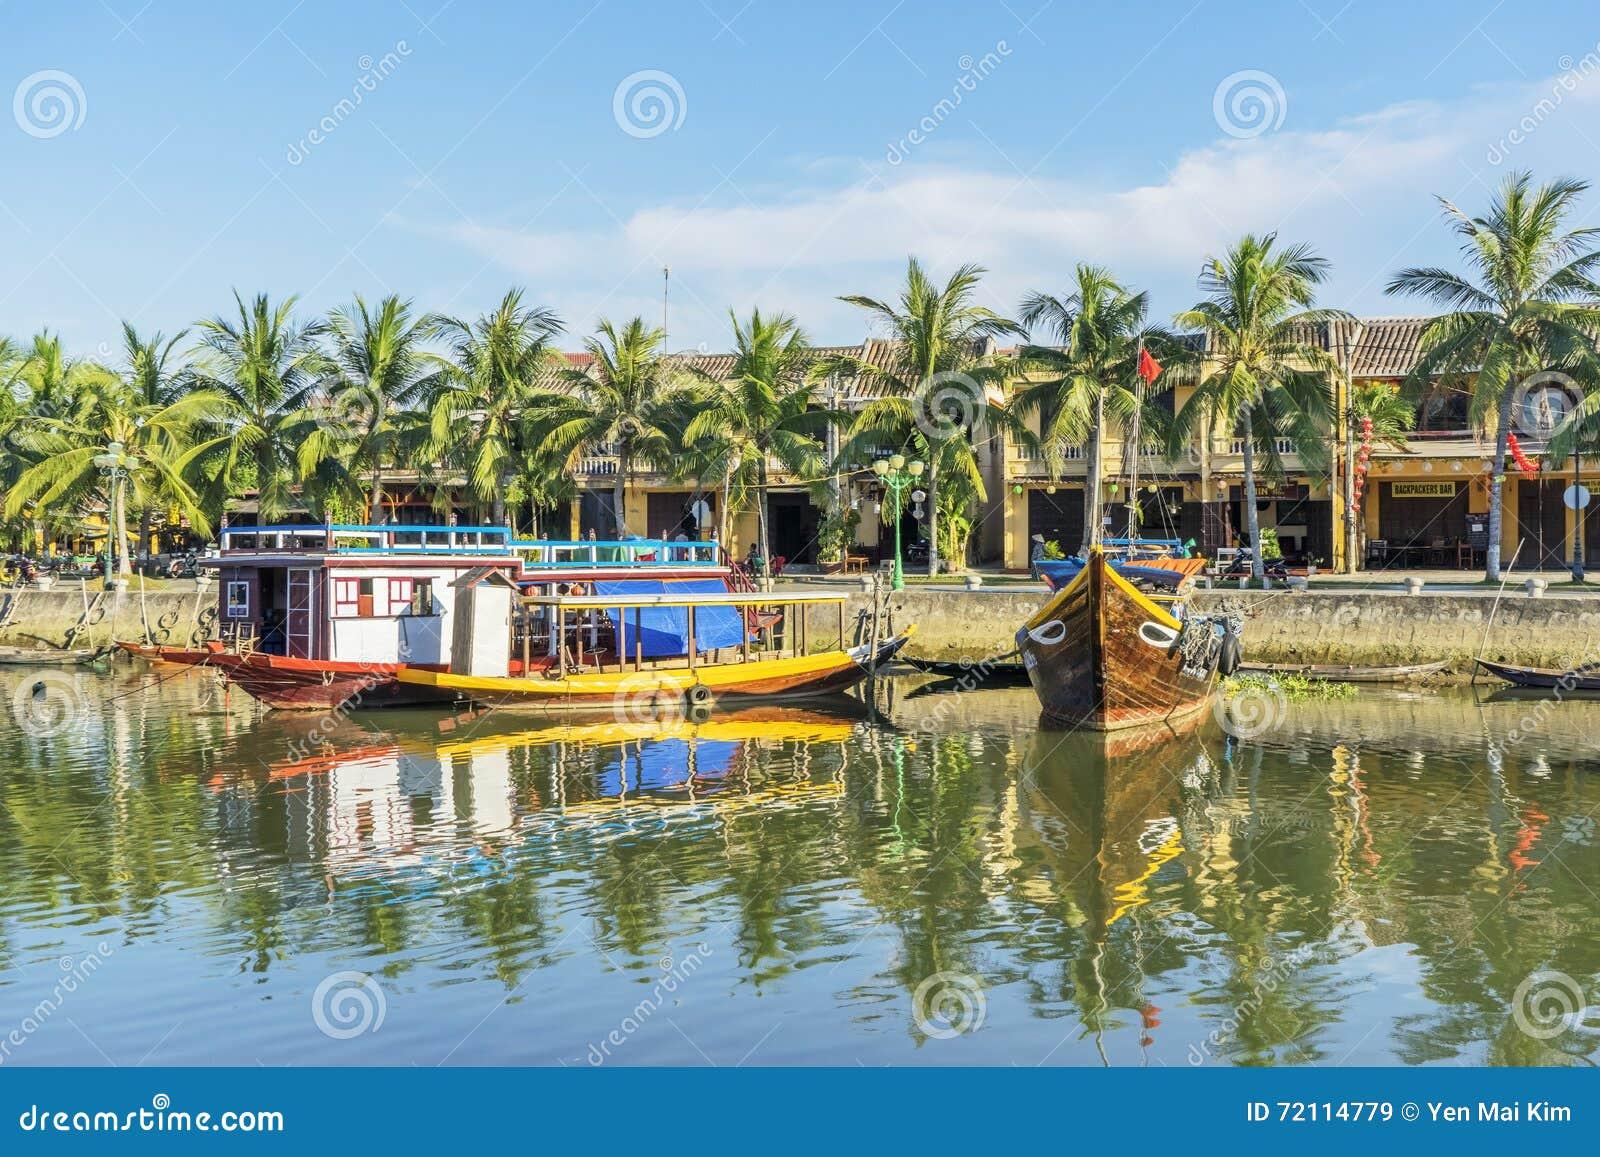 Hoi An Ancient town, Quang Nam province, Vietnam